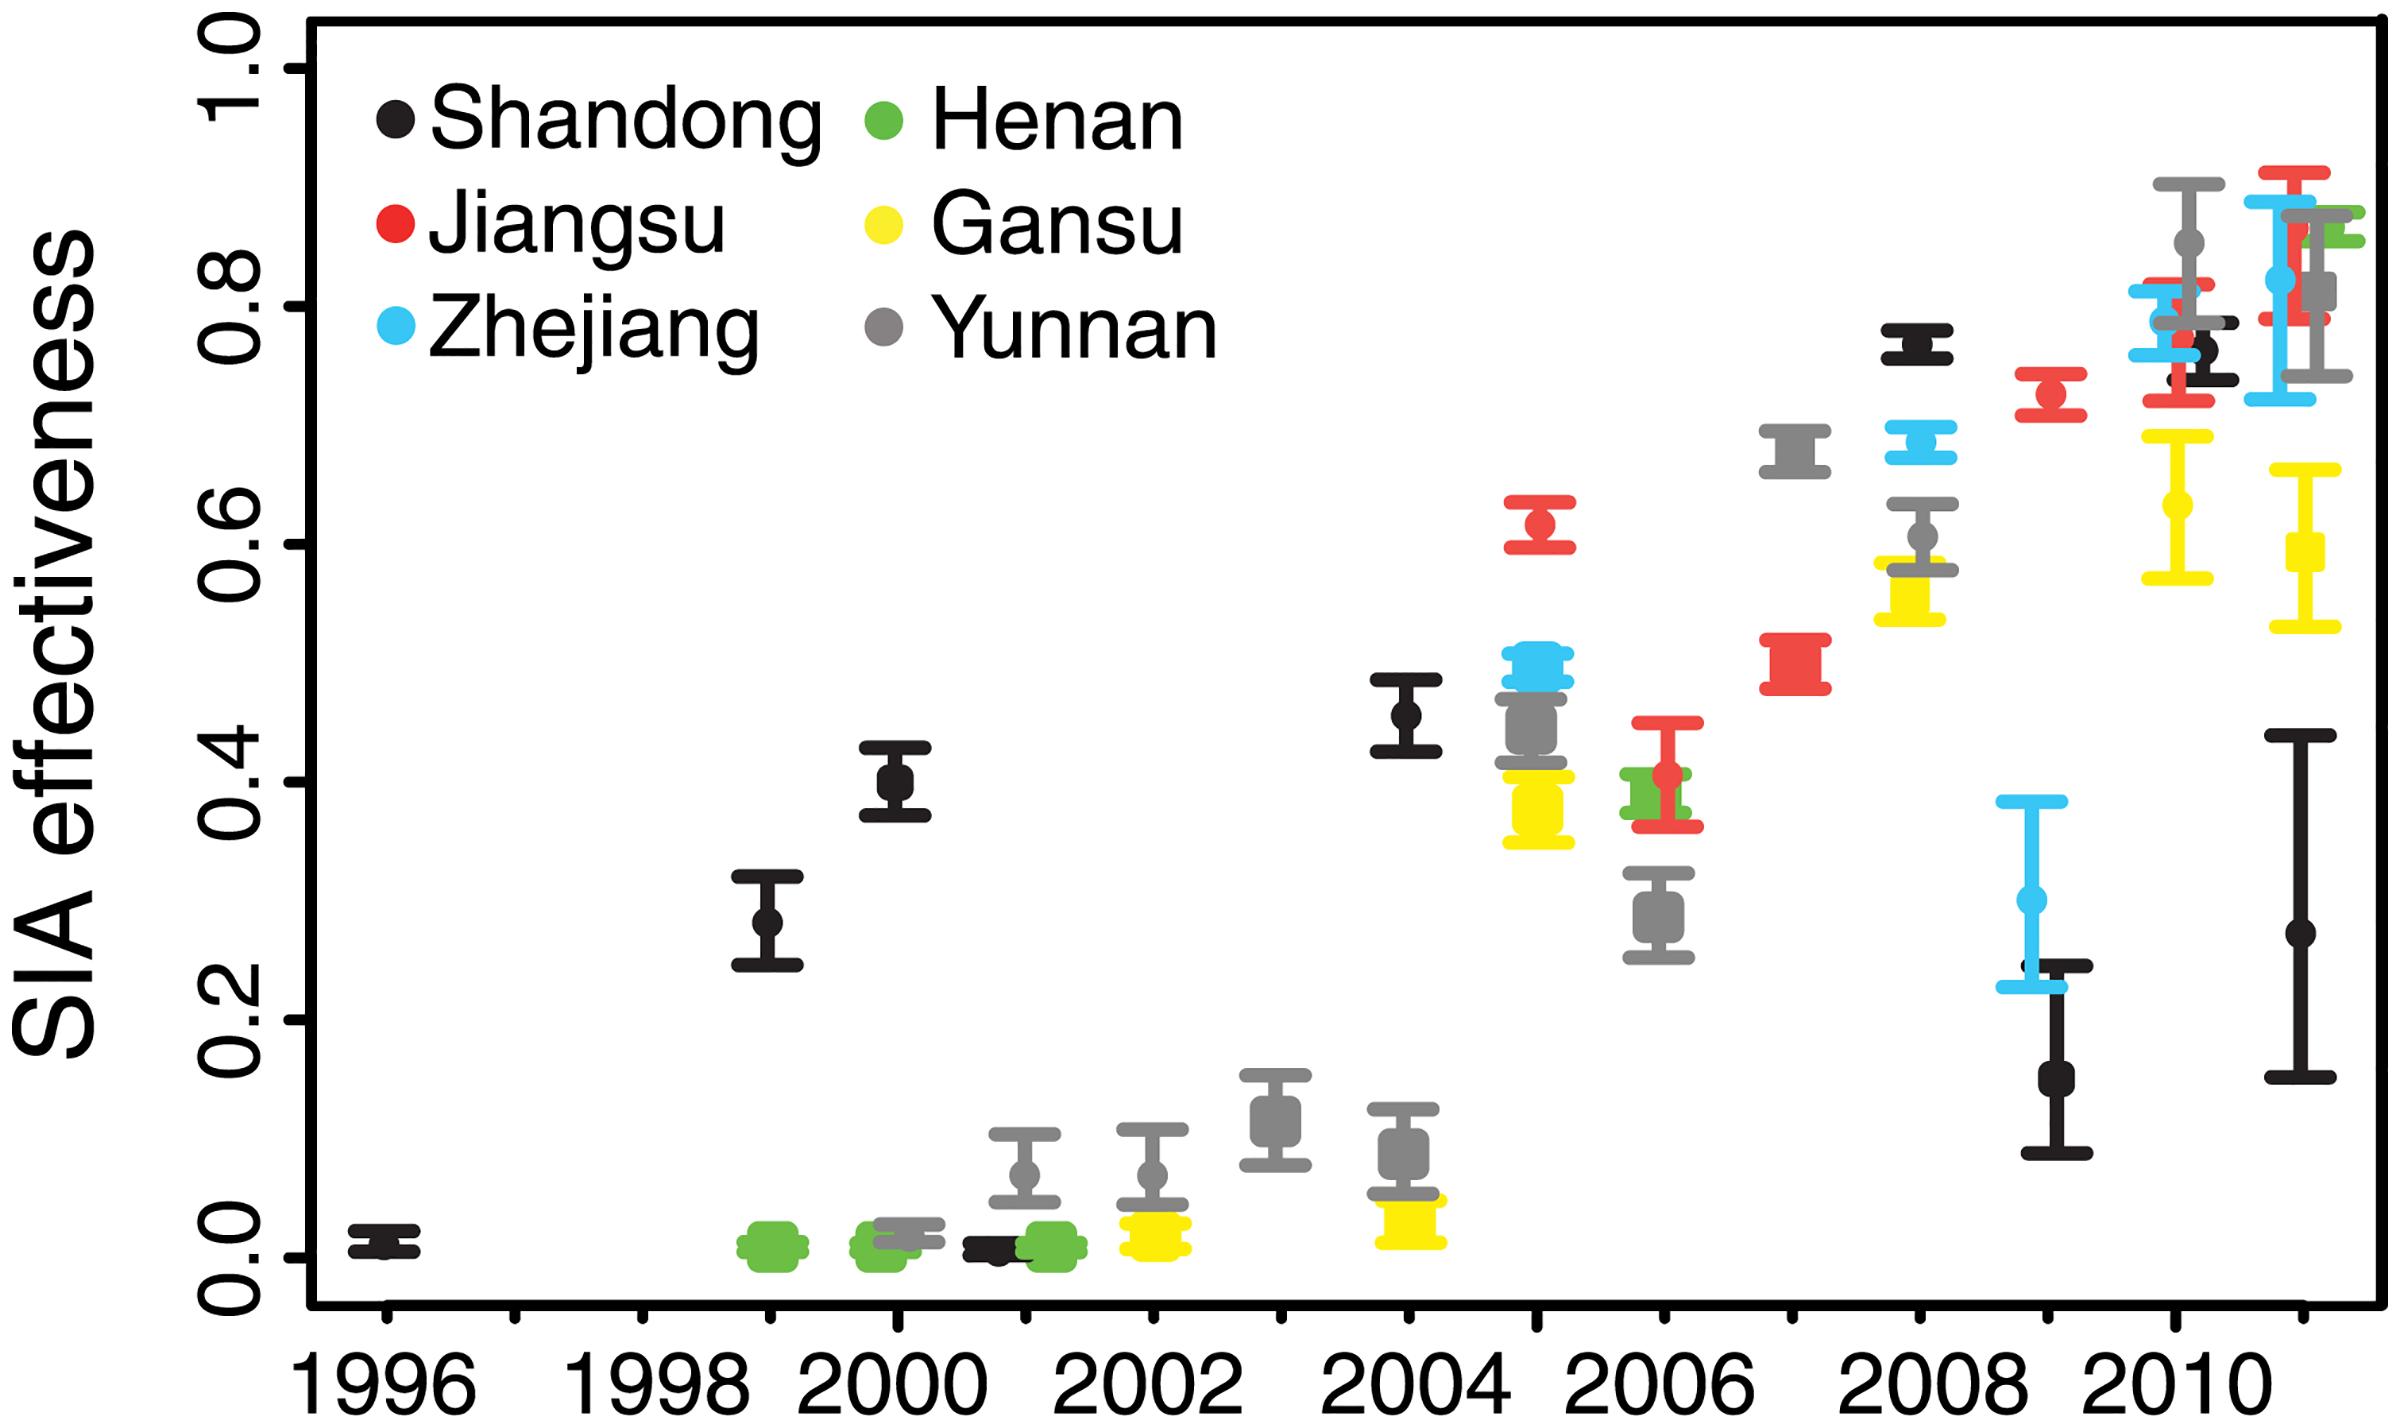 Estimated effectiveness of supplementary immunization activities in six focal provinces.